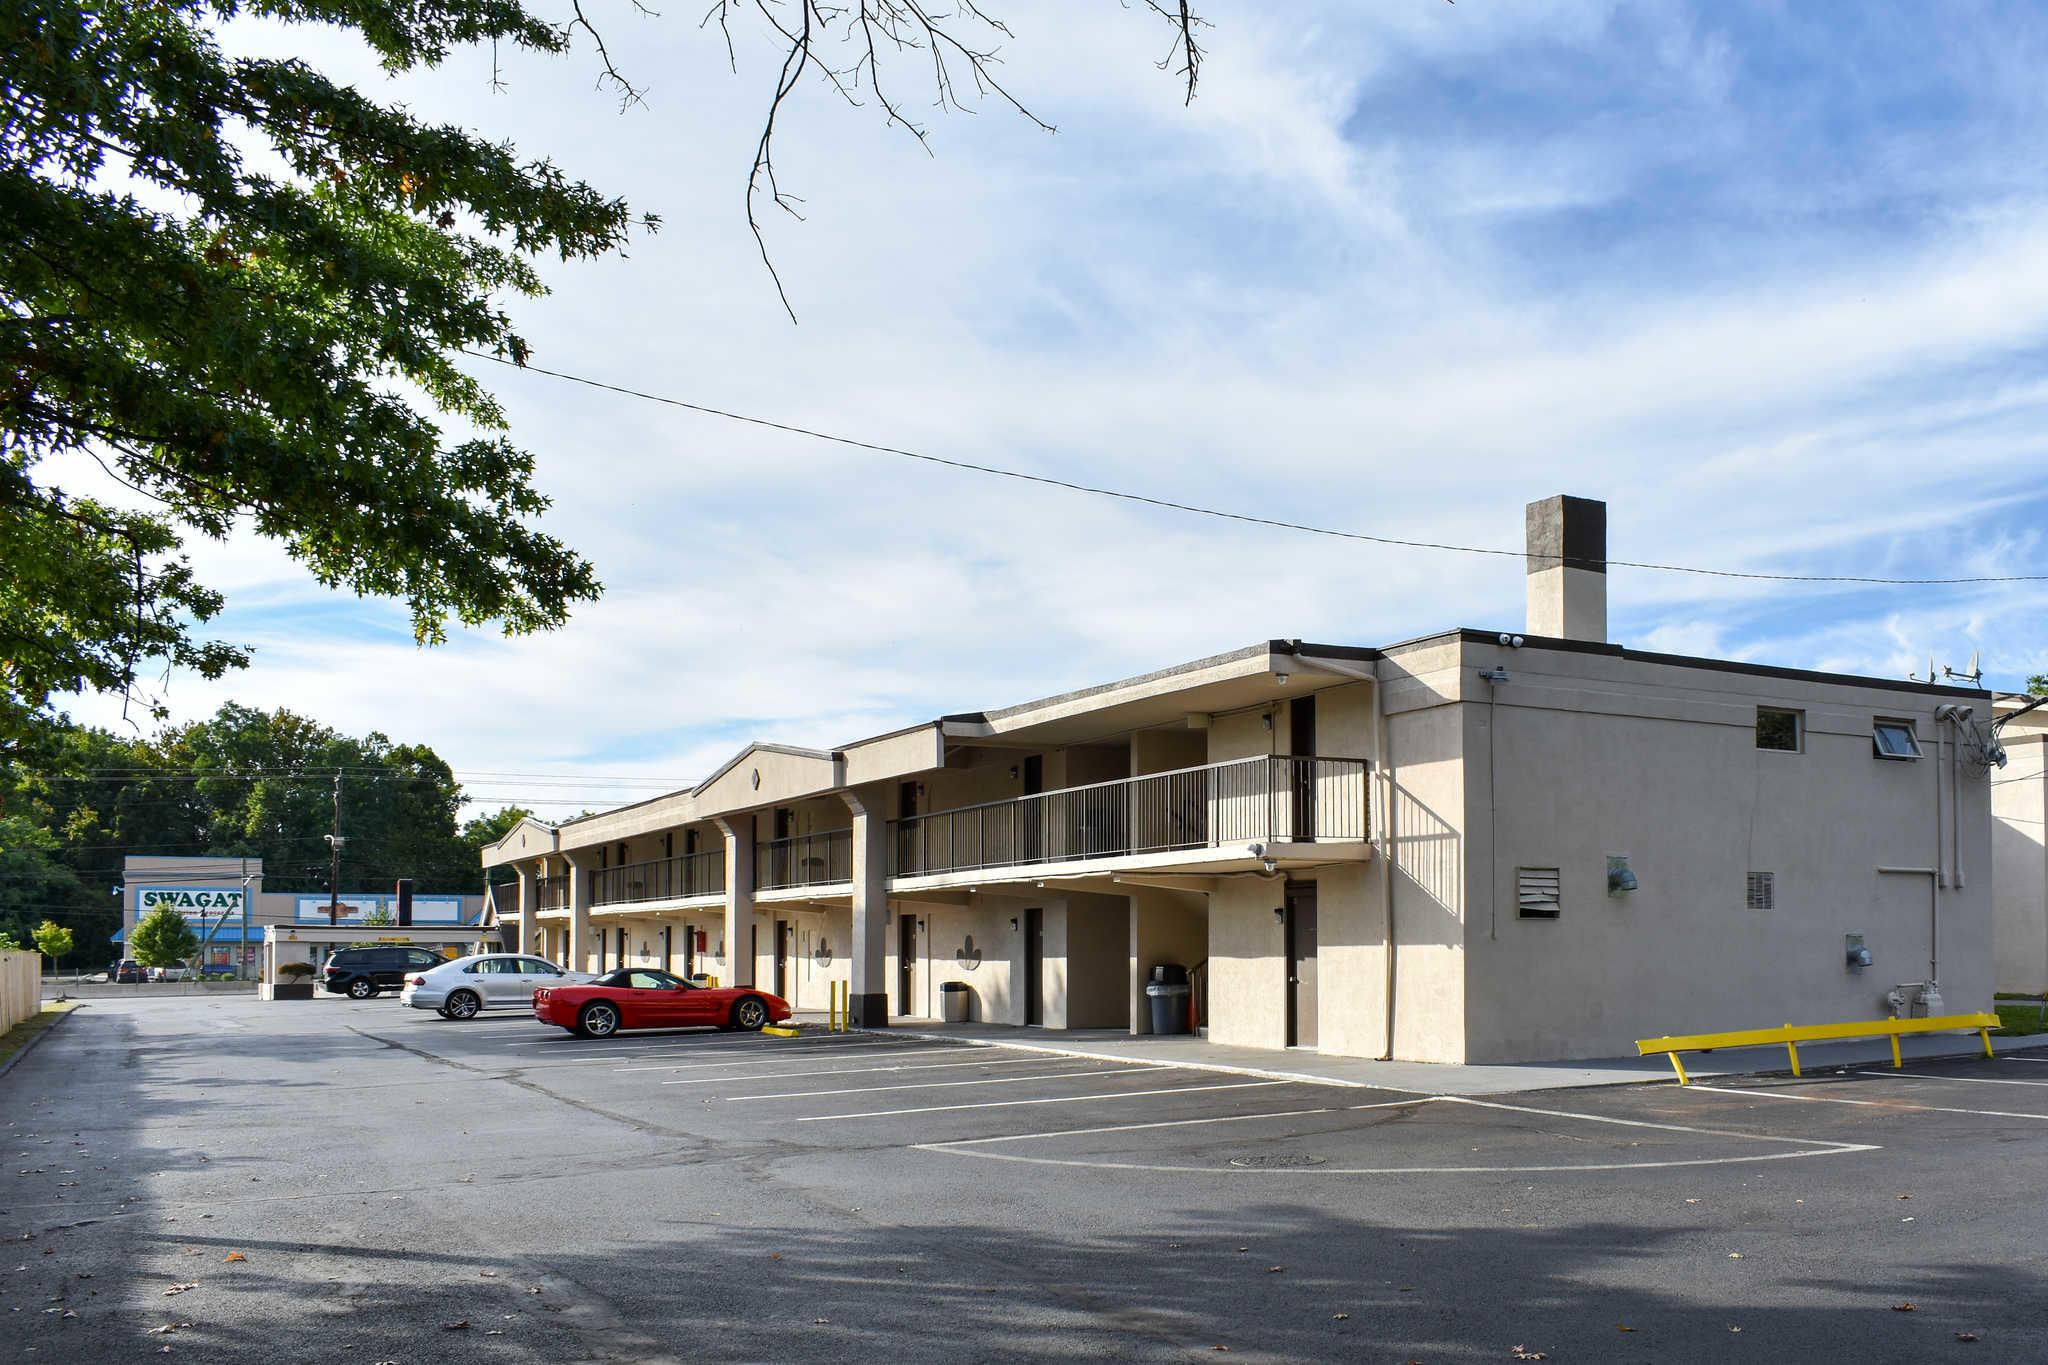 Econo Lodge Inn & Suites - Closed image 7